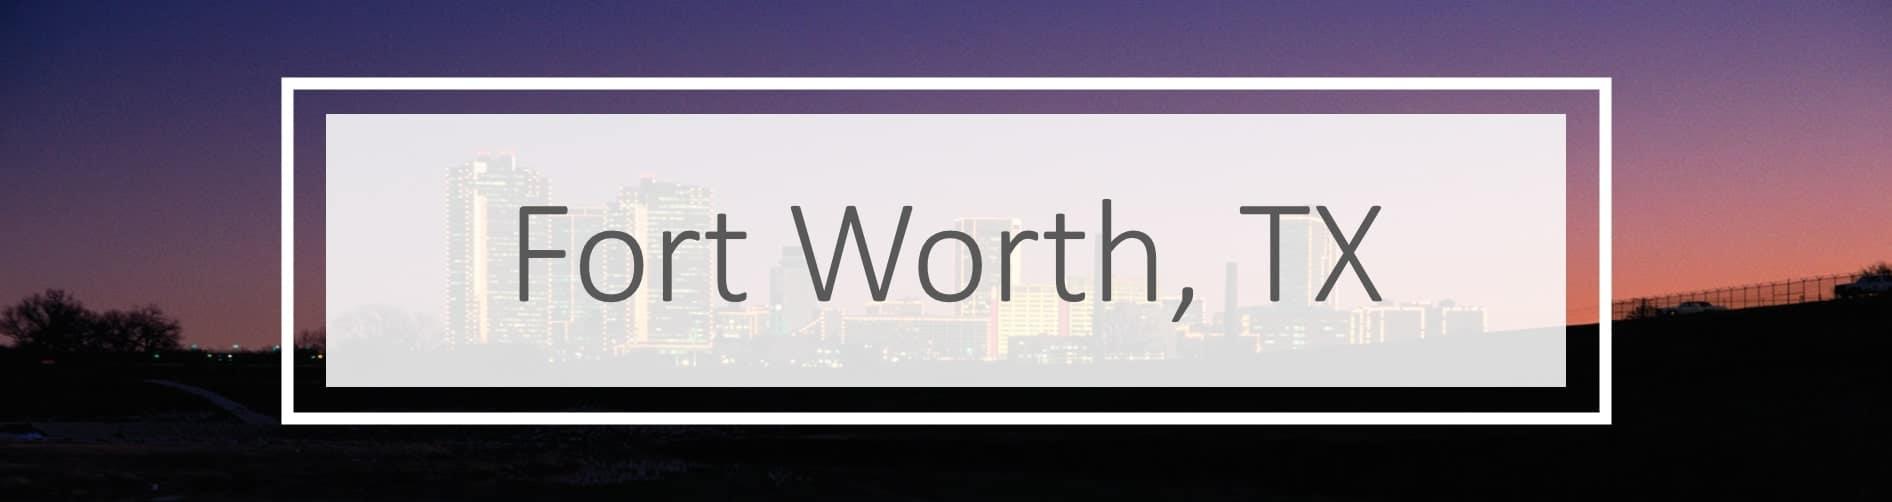 Jaguar Oklahoma City Serving Fort Worth